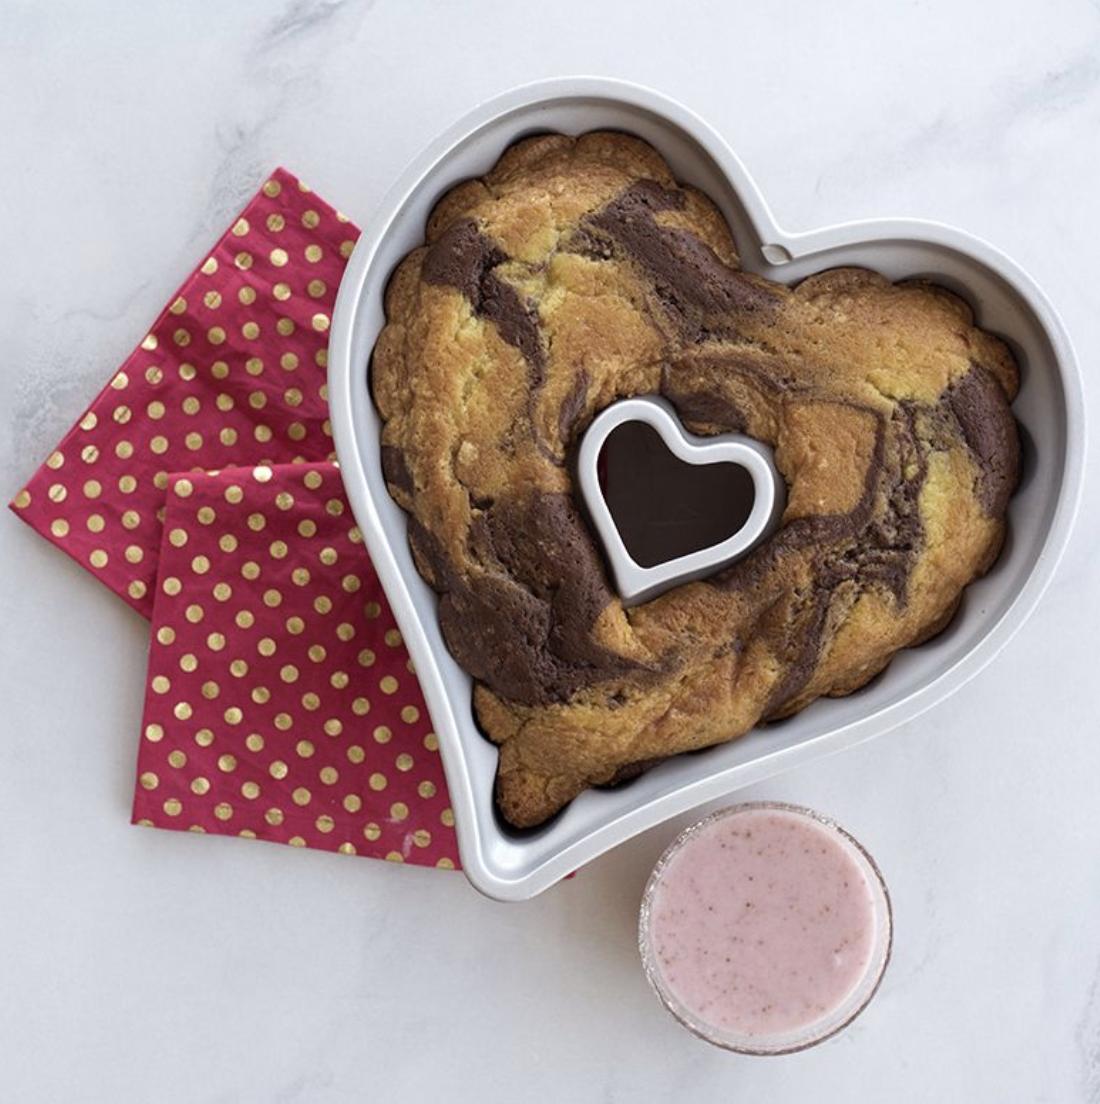 Elegant Heart Bundt Pan, 10 cup